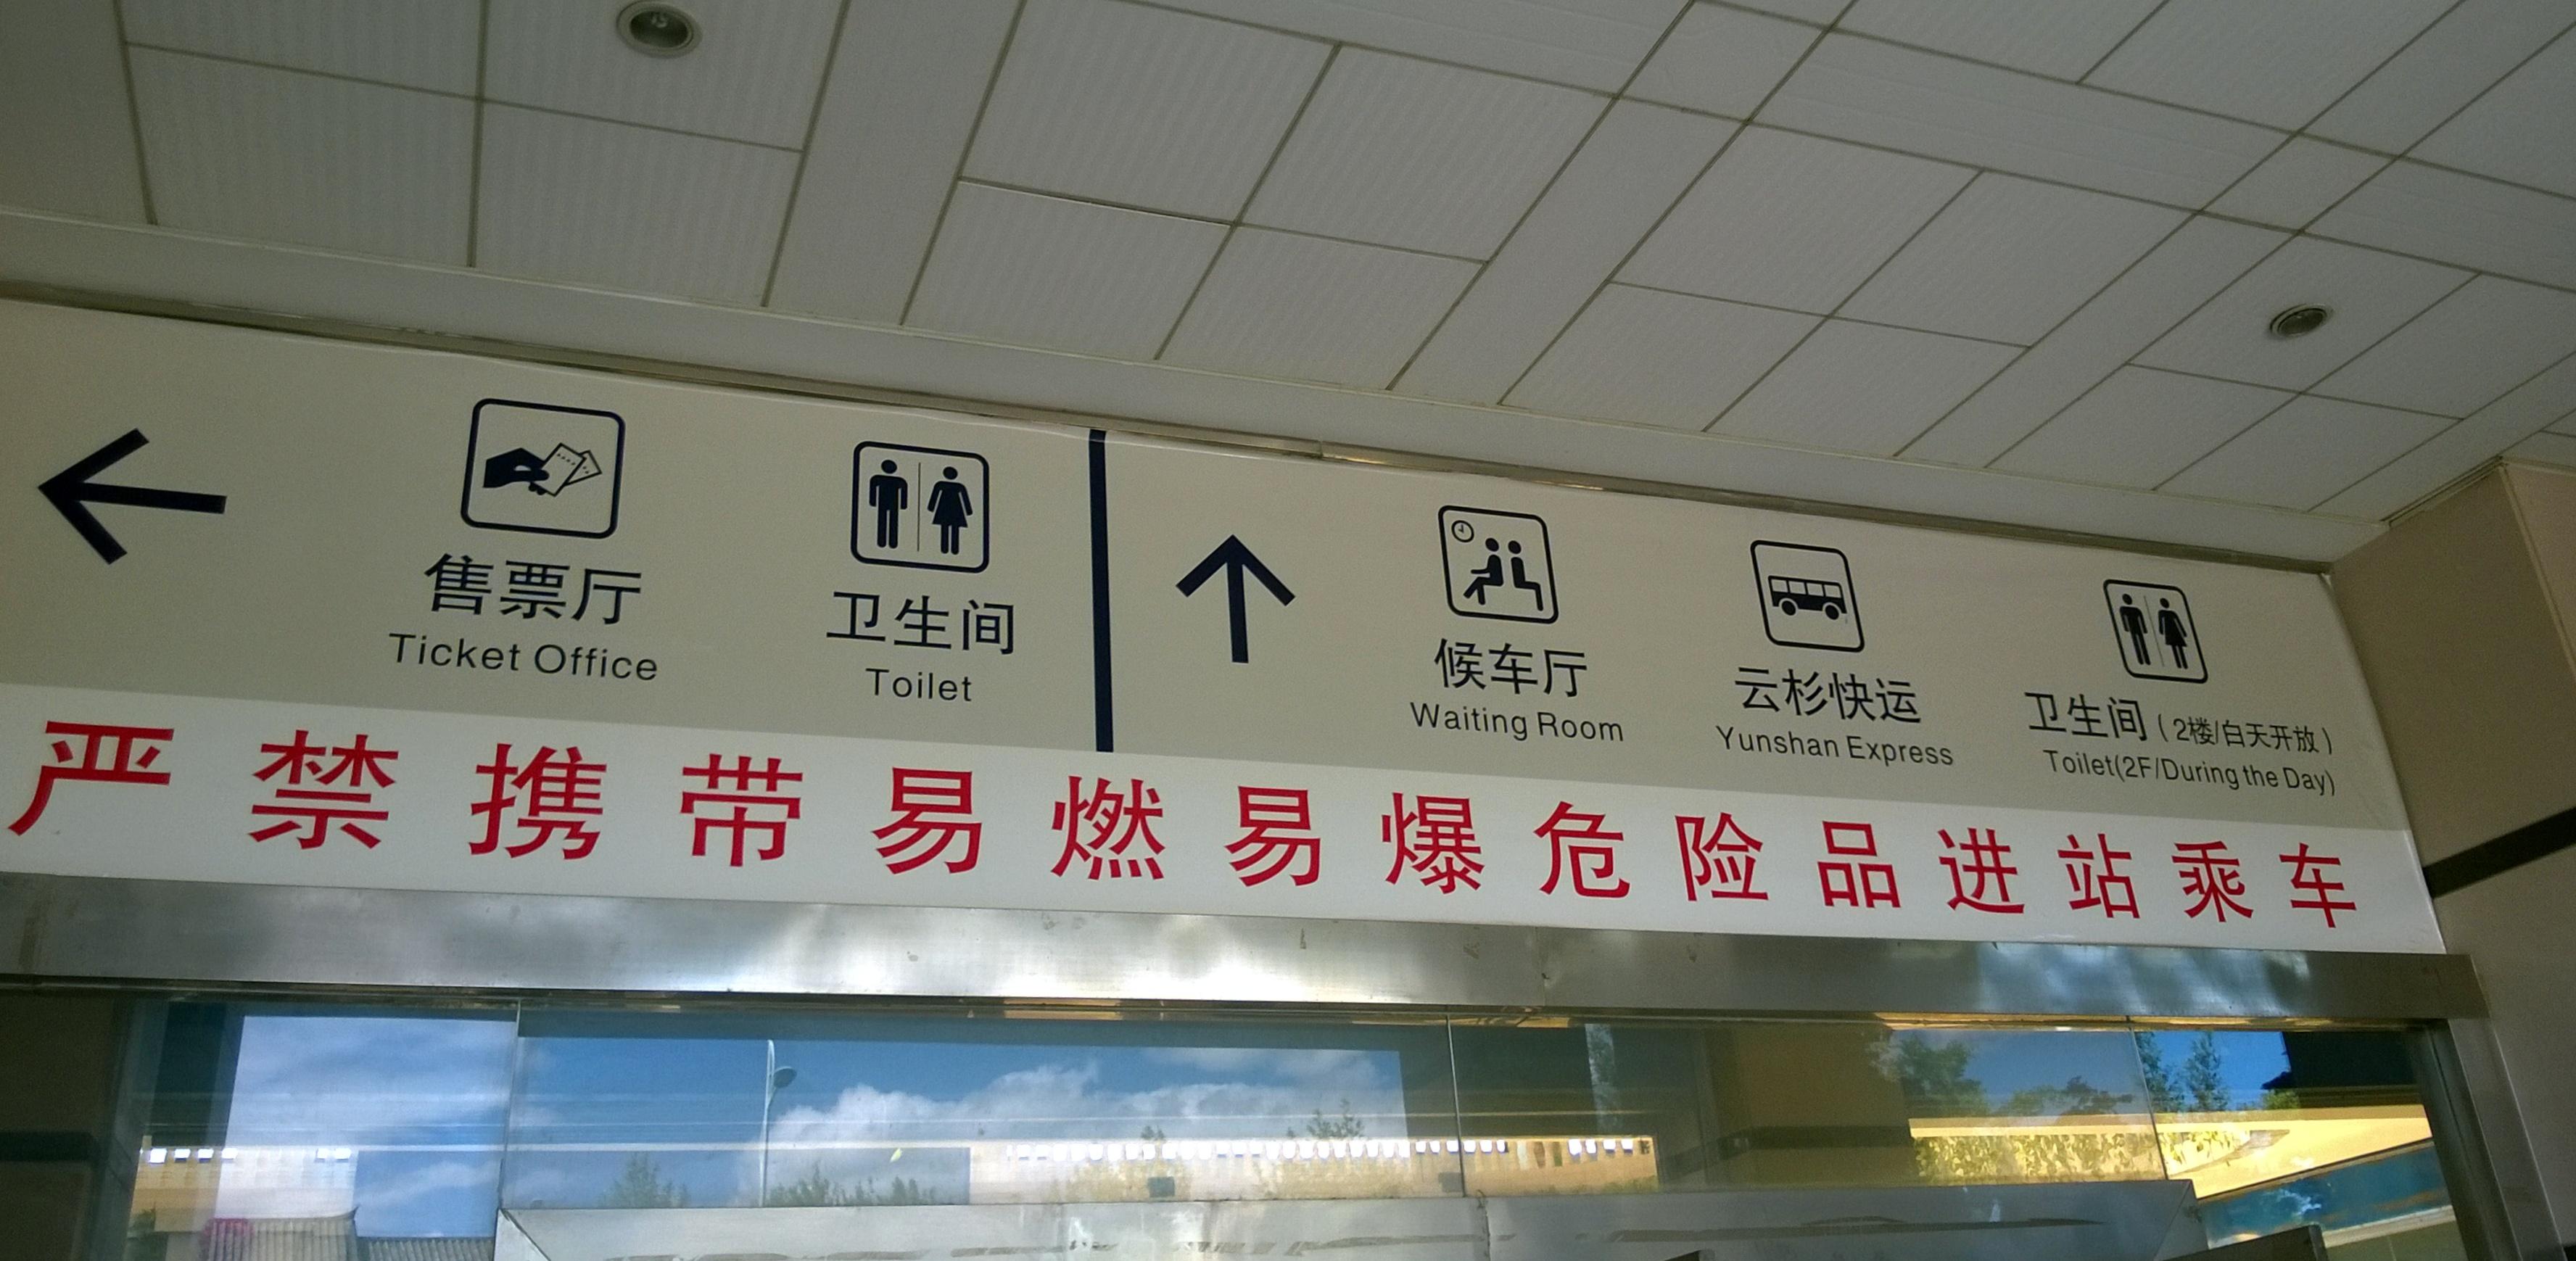 lijiang bus station english